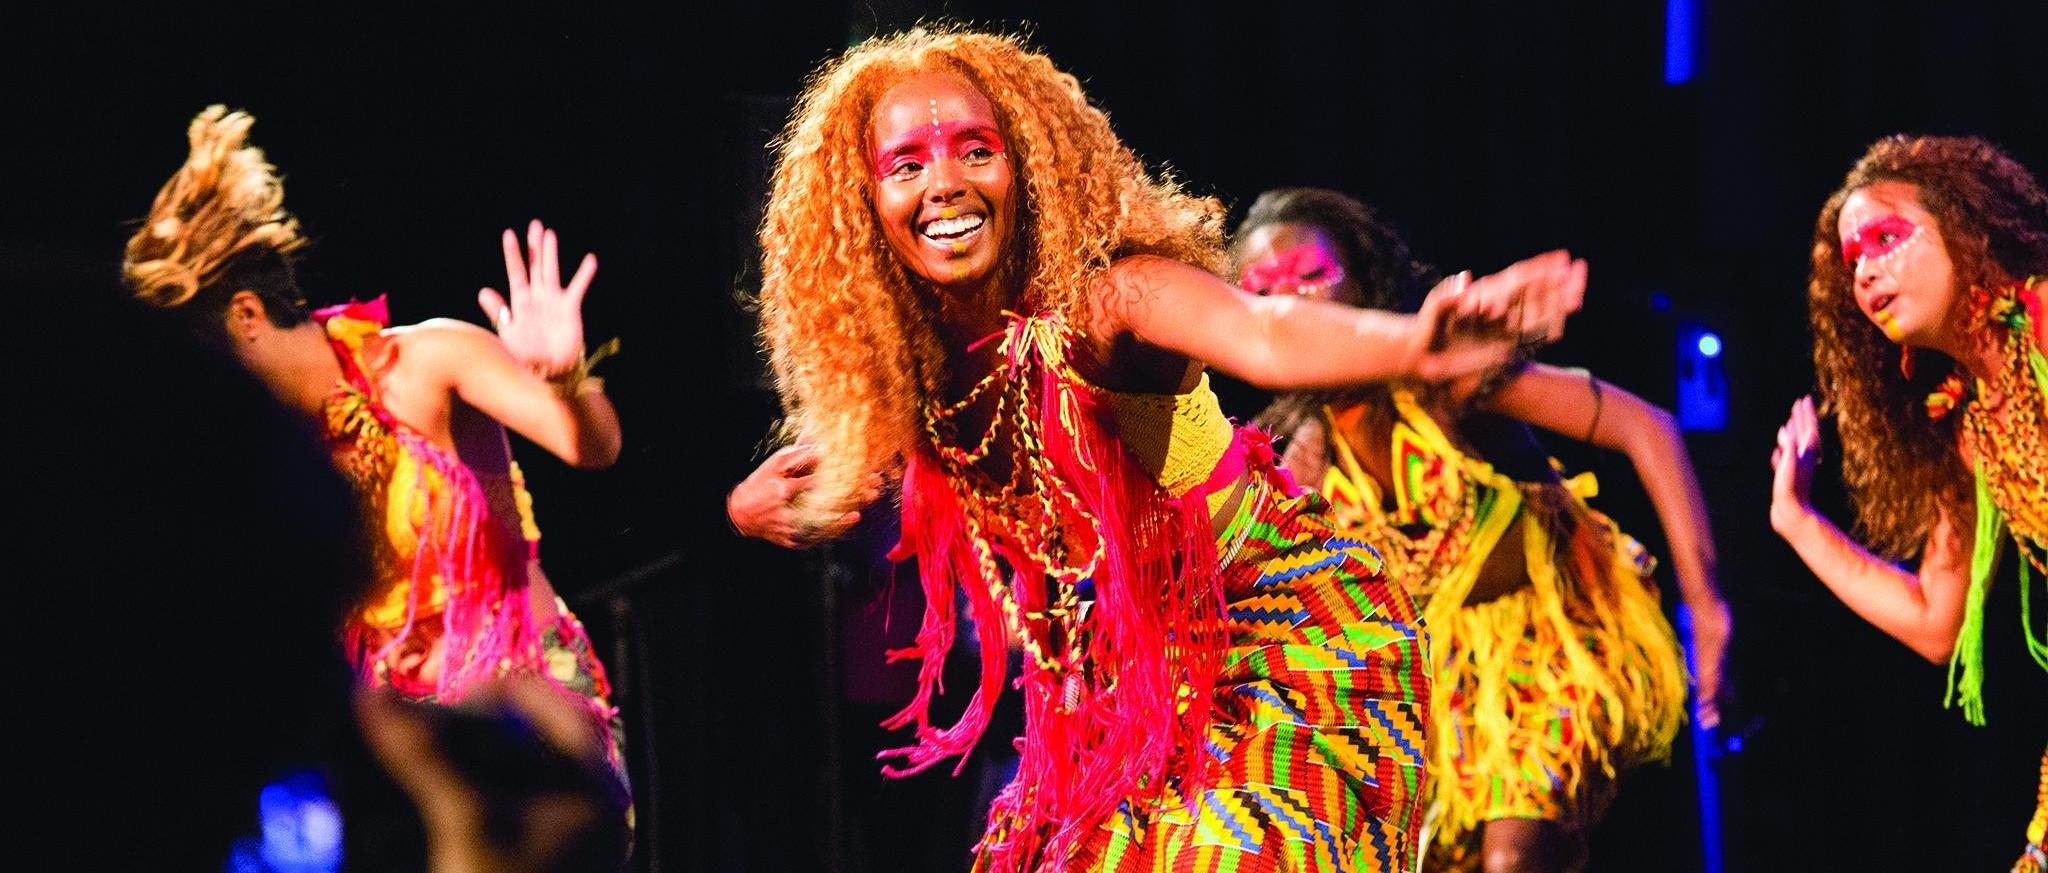 Dance Workshops at Wow, Festival 2018